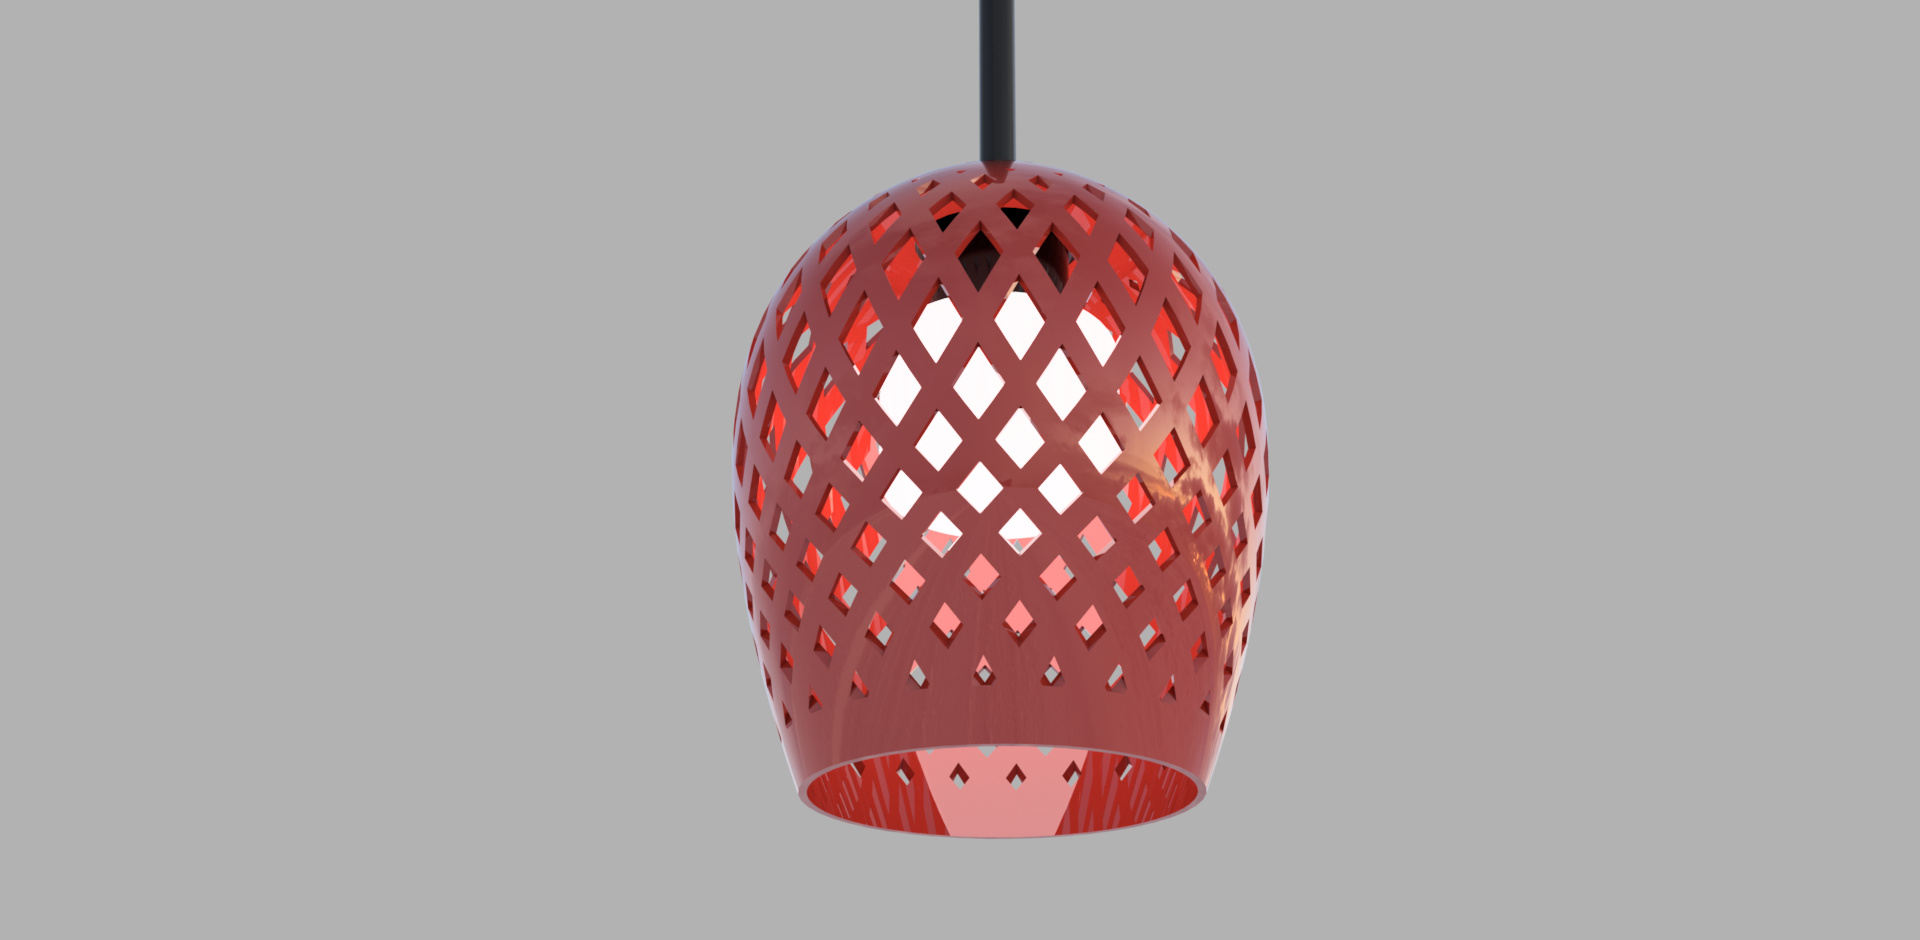 Fusion 360 Lampshade Tutorial - CAD - Talk Manufacturing | 3D Hubs